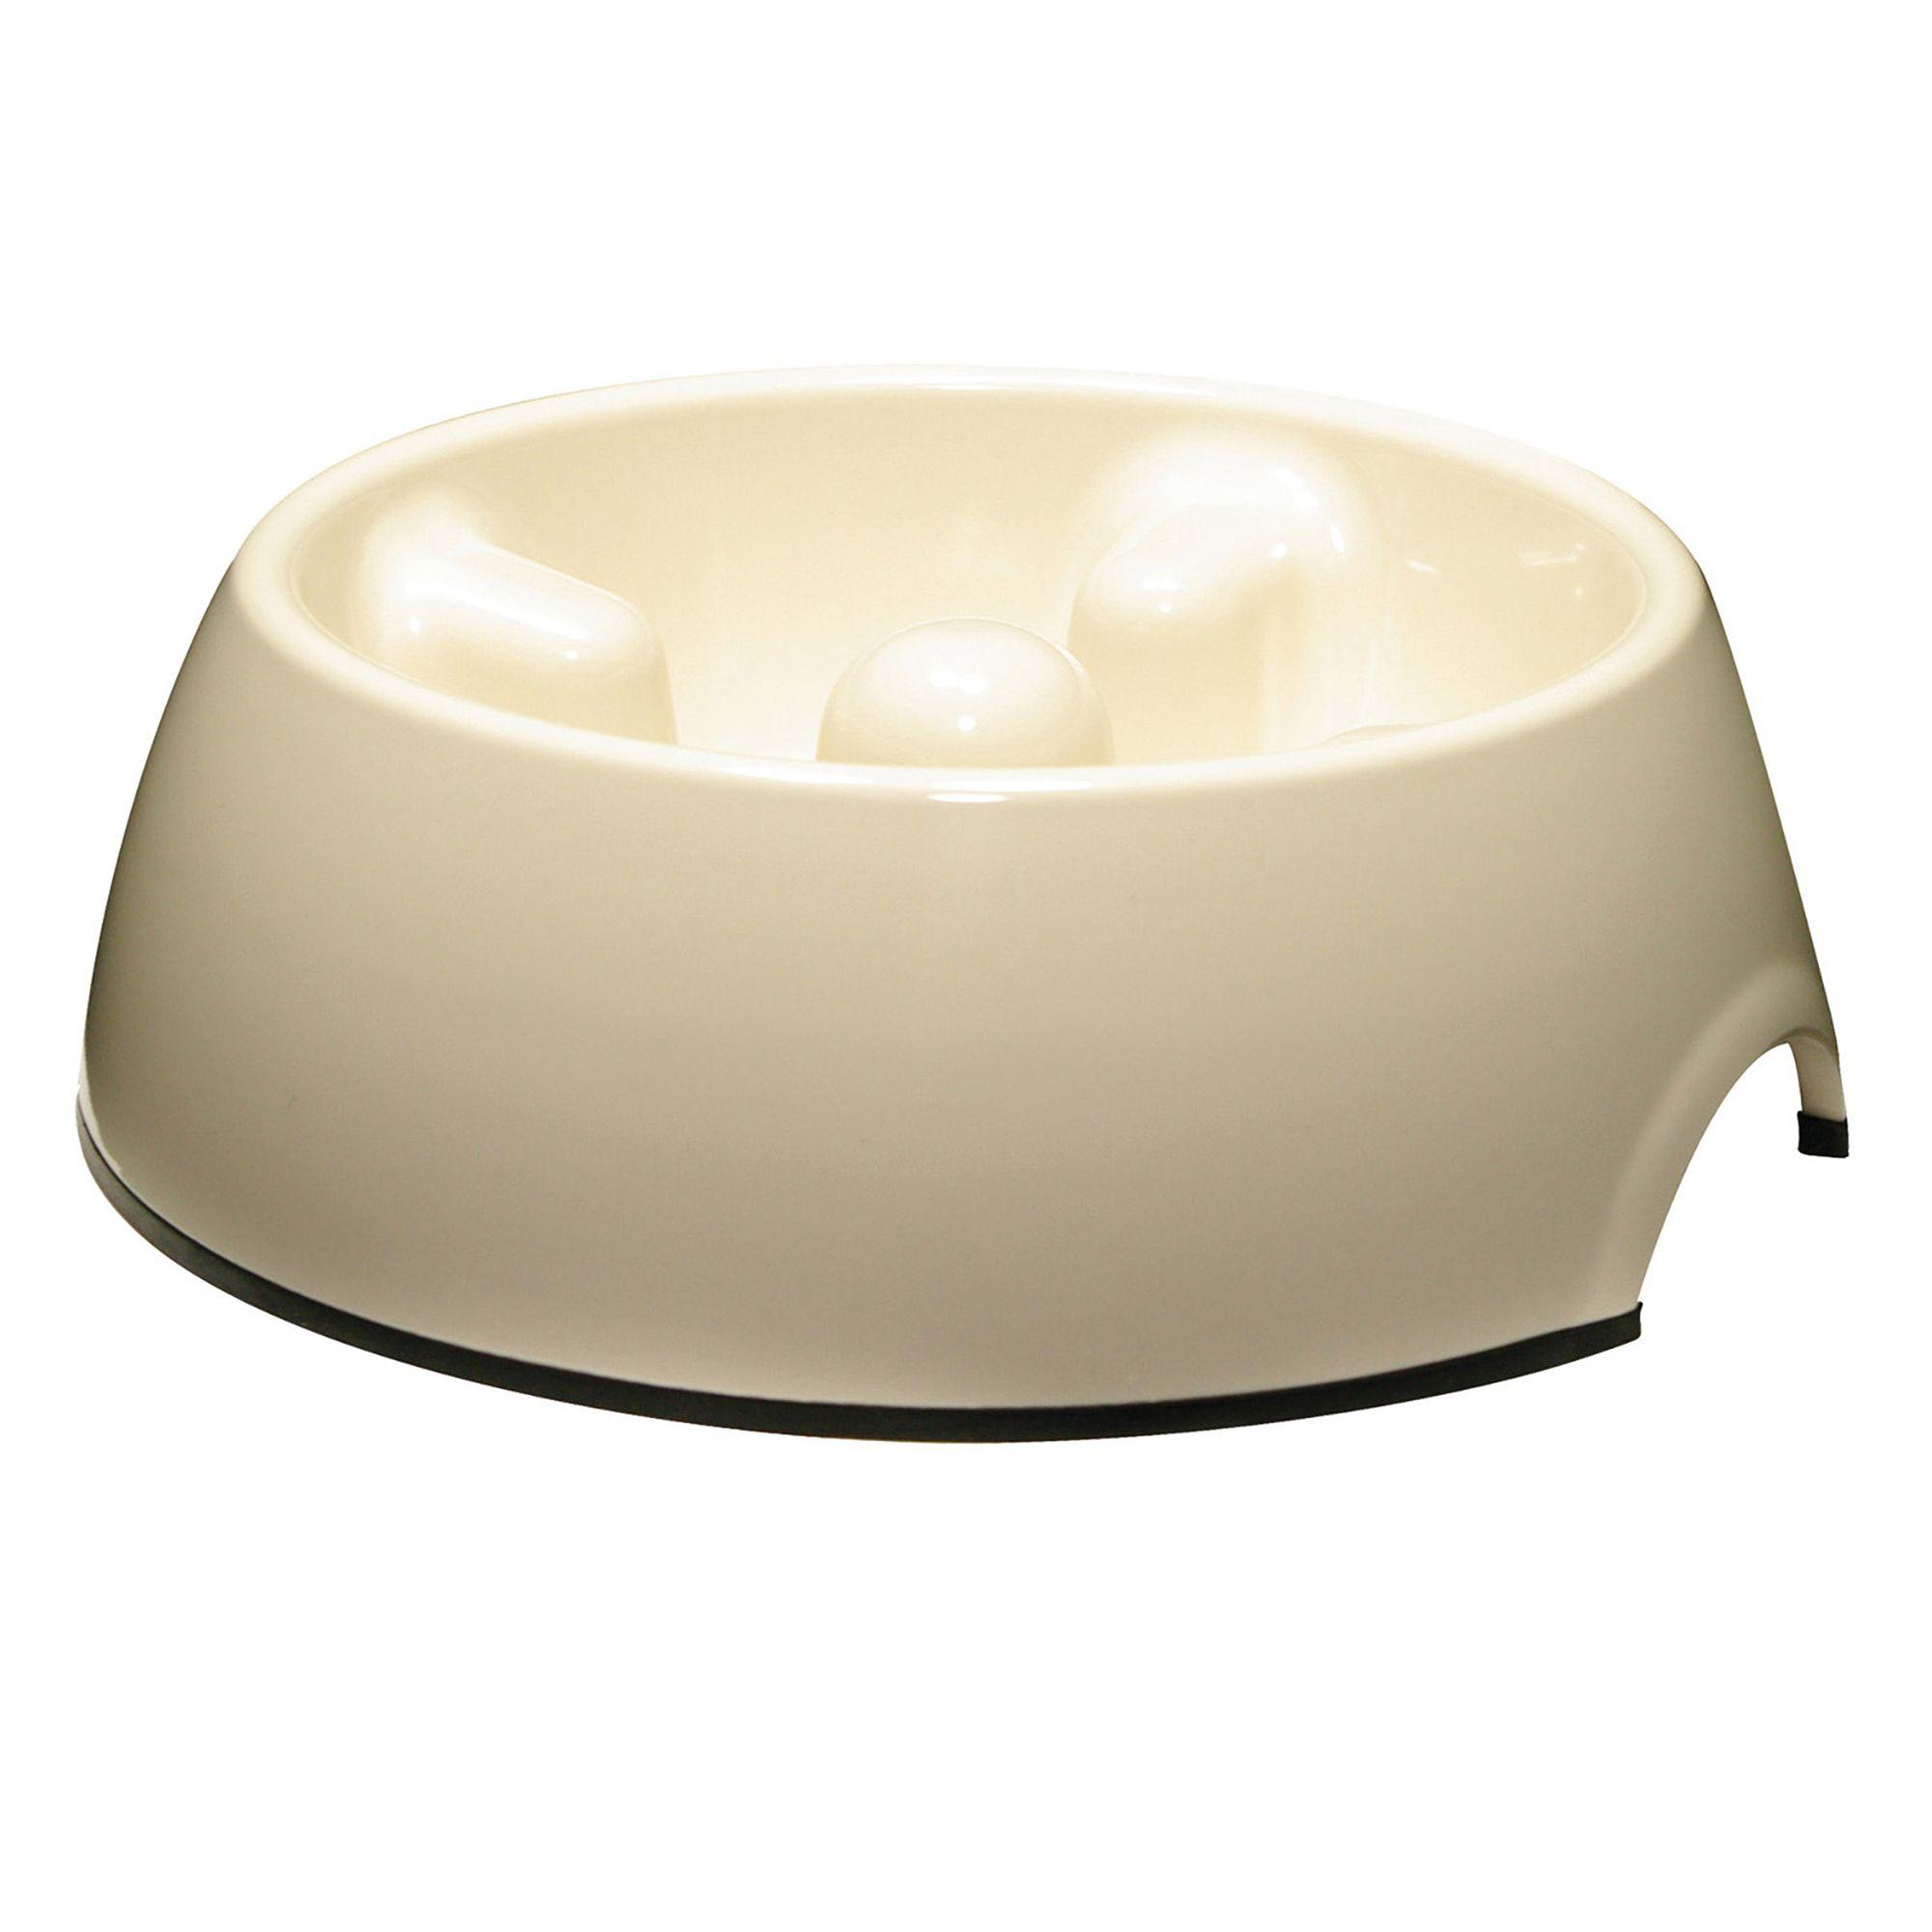 Dogit Go Slow Dog Bowl Size 20.2 Fl Oz White